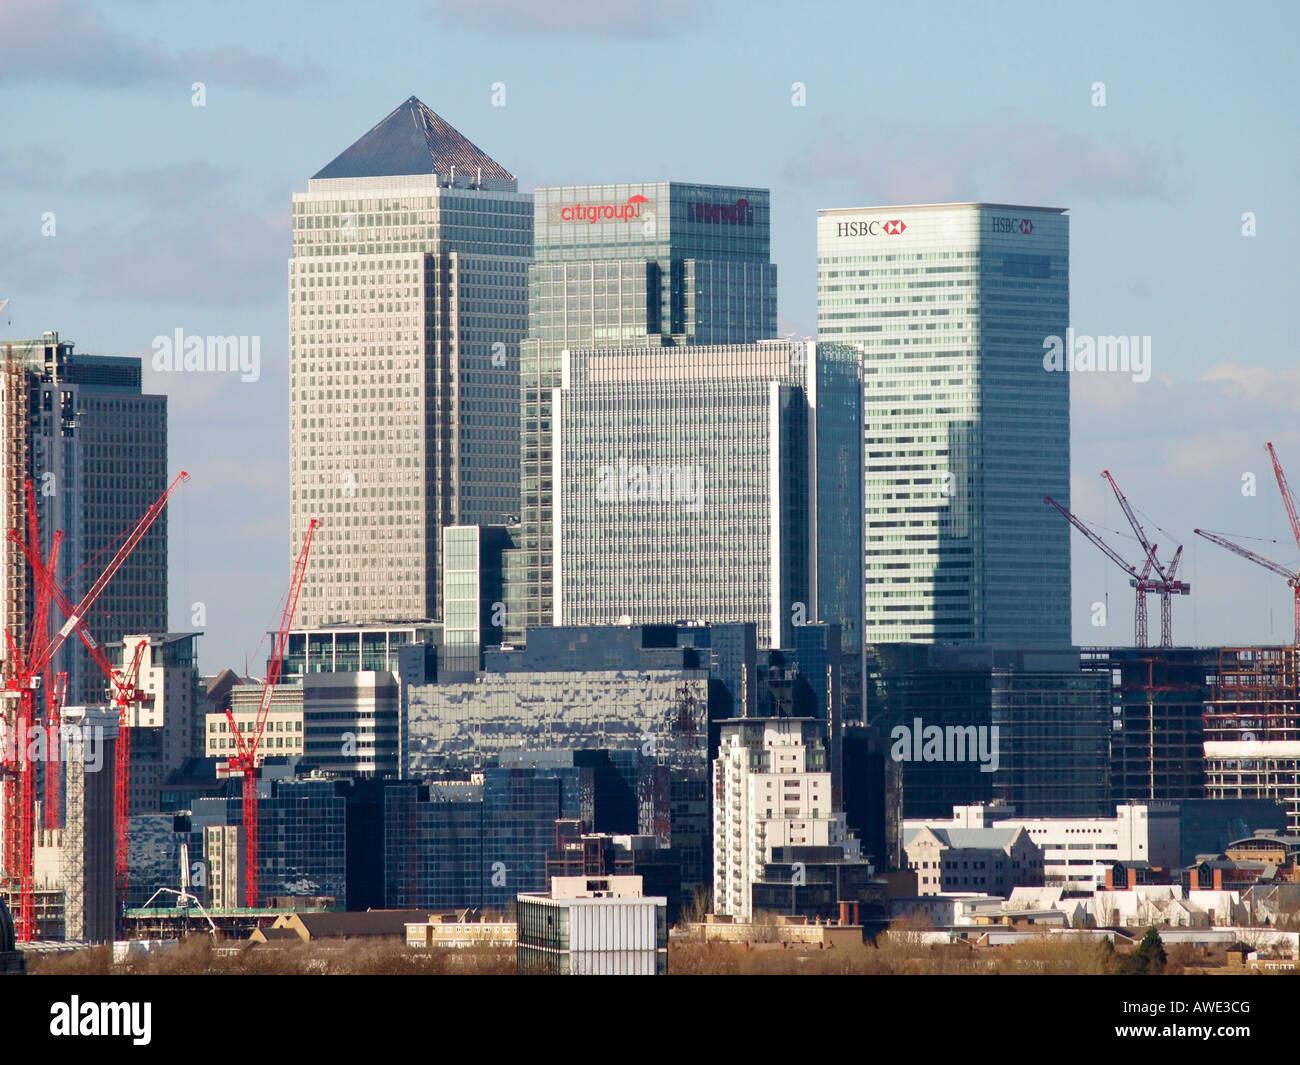 Canary Wharf London England - Stock Image